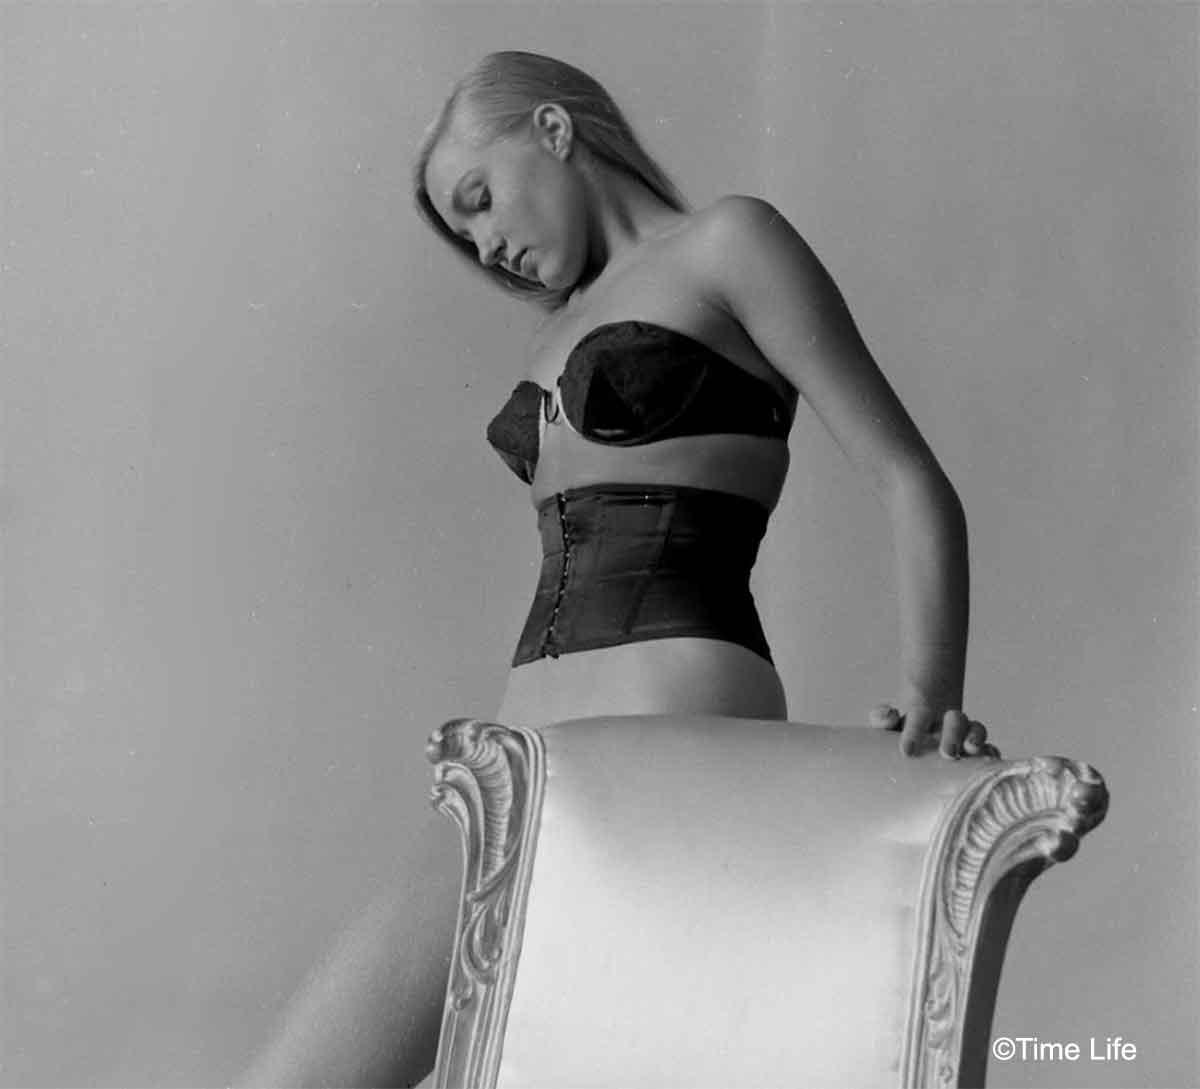 1940s-Fashion---Waist-Pinchers-1949